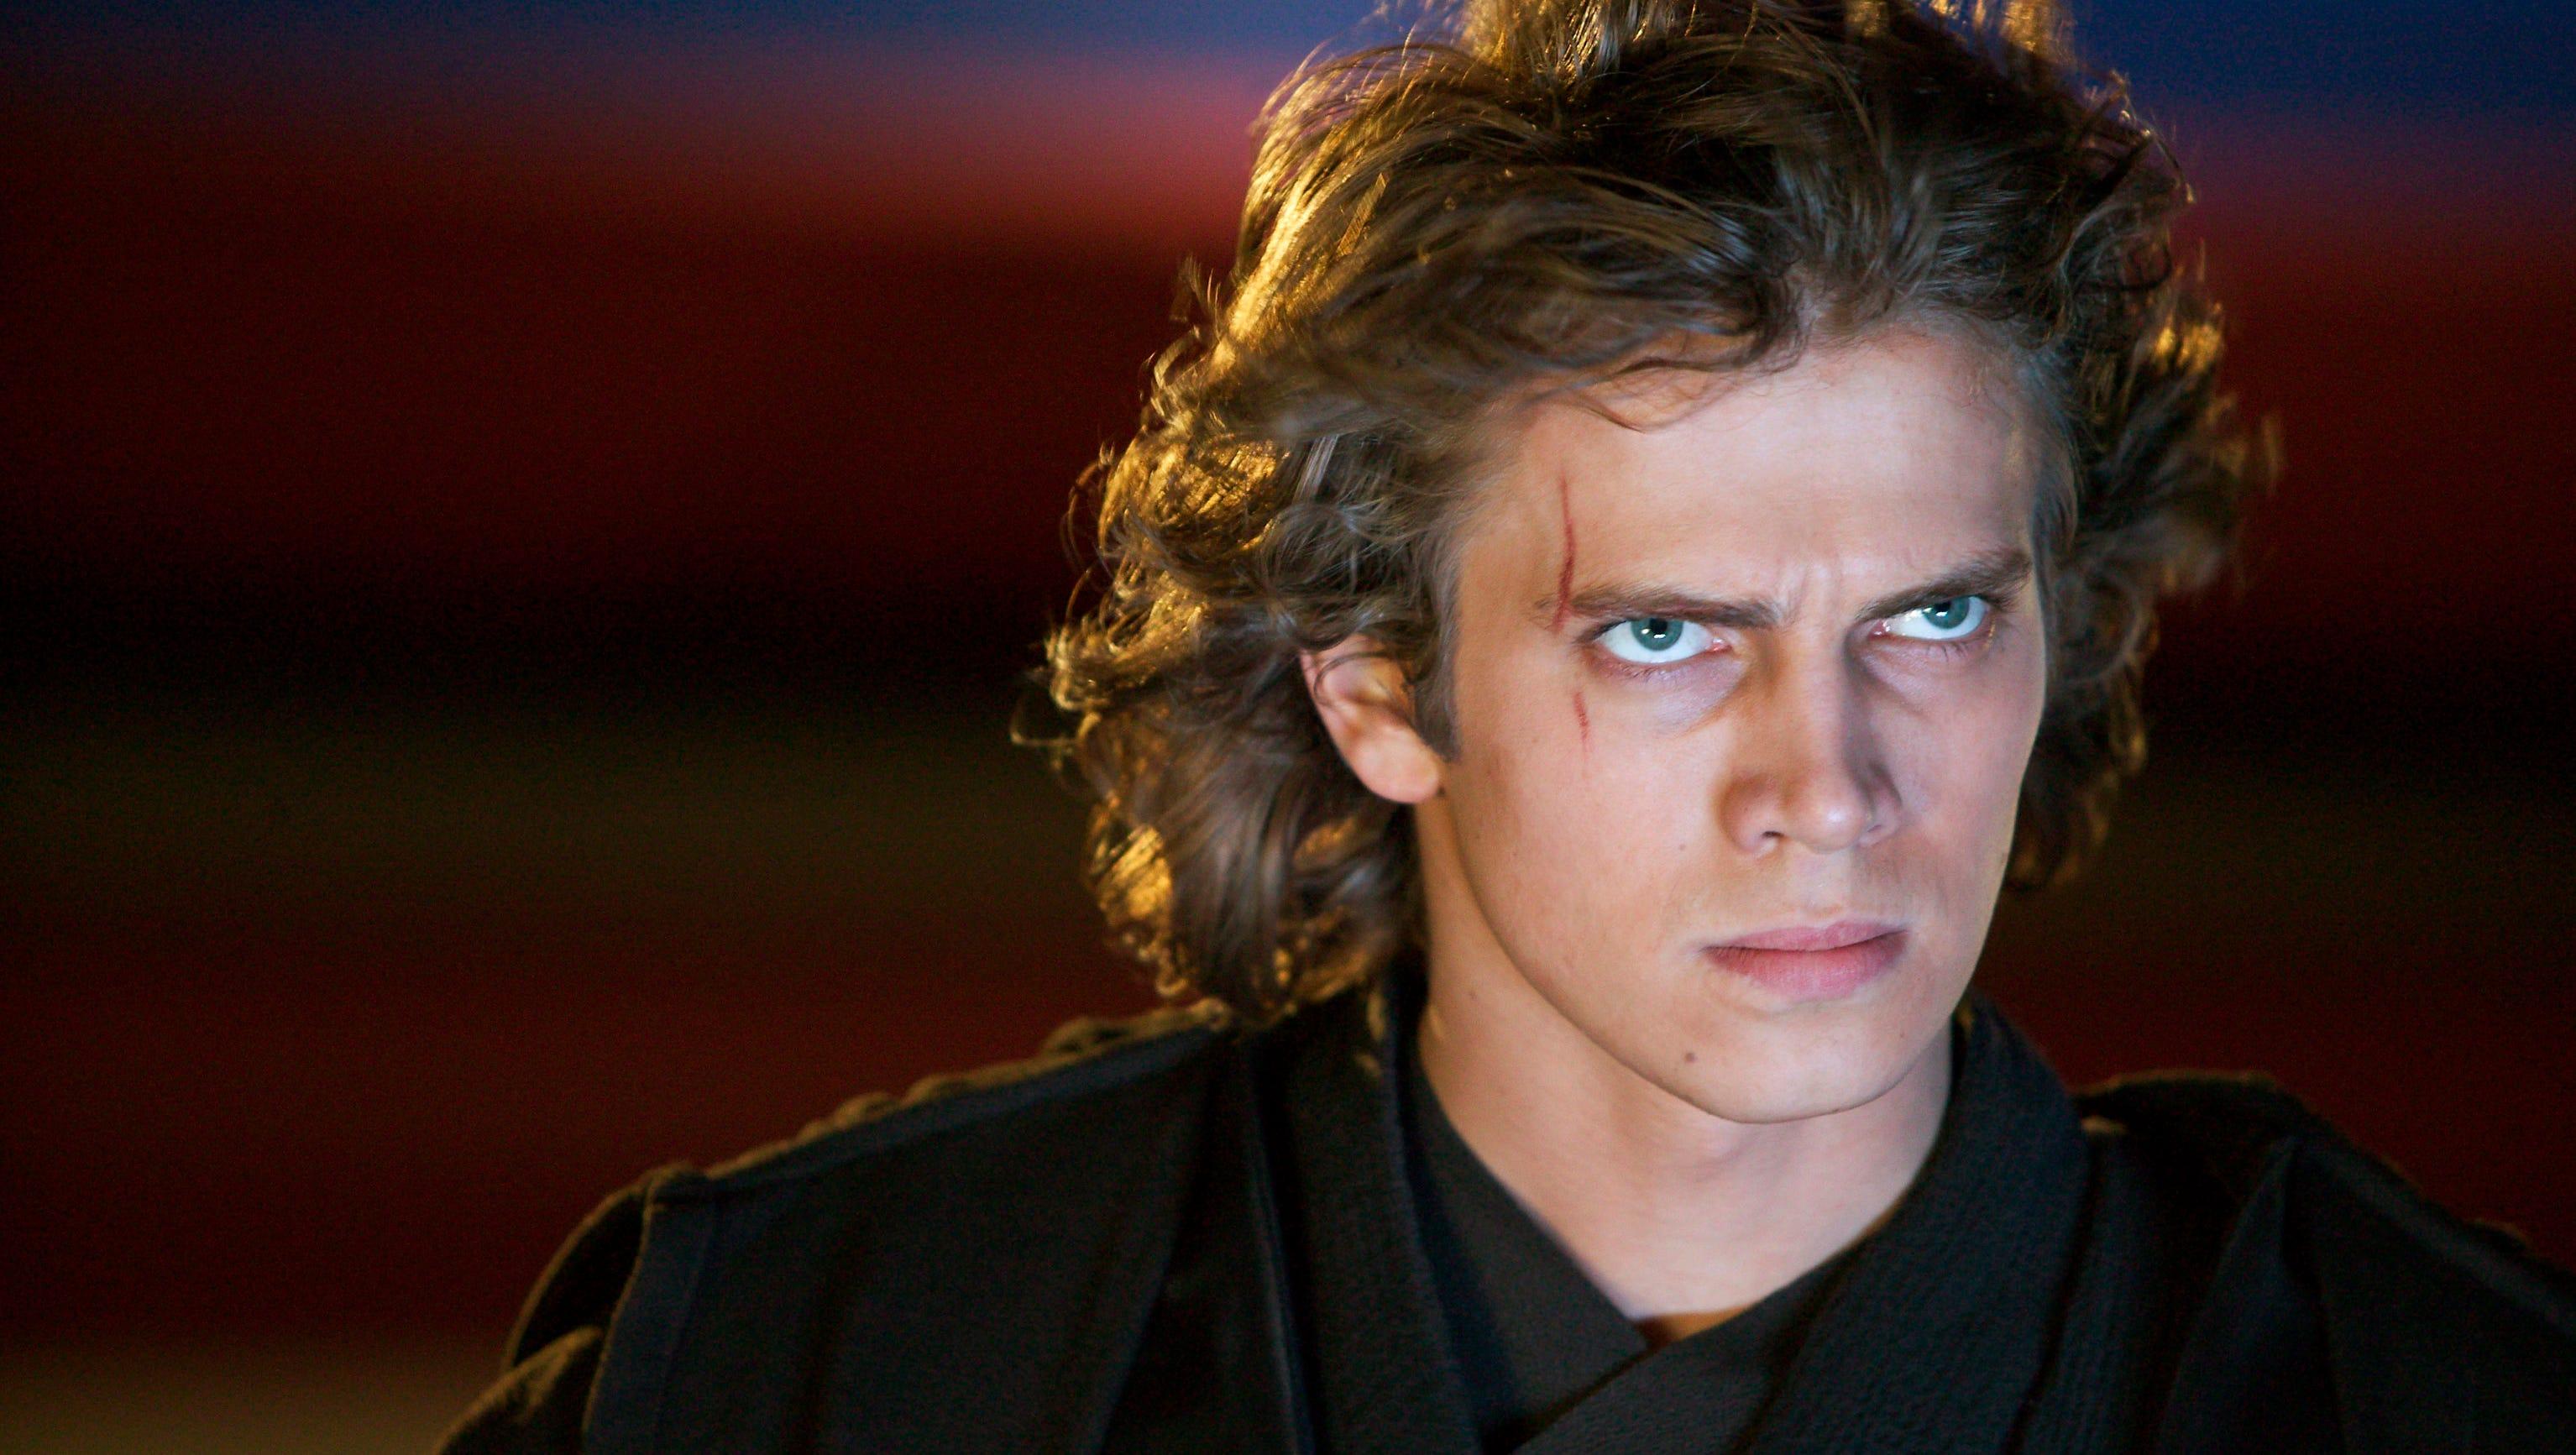 In Star Wars, Anakin Skywalker shouldn't have been in the Jedi Order